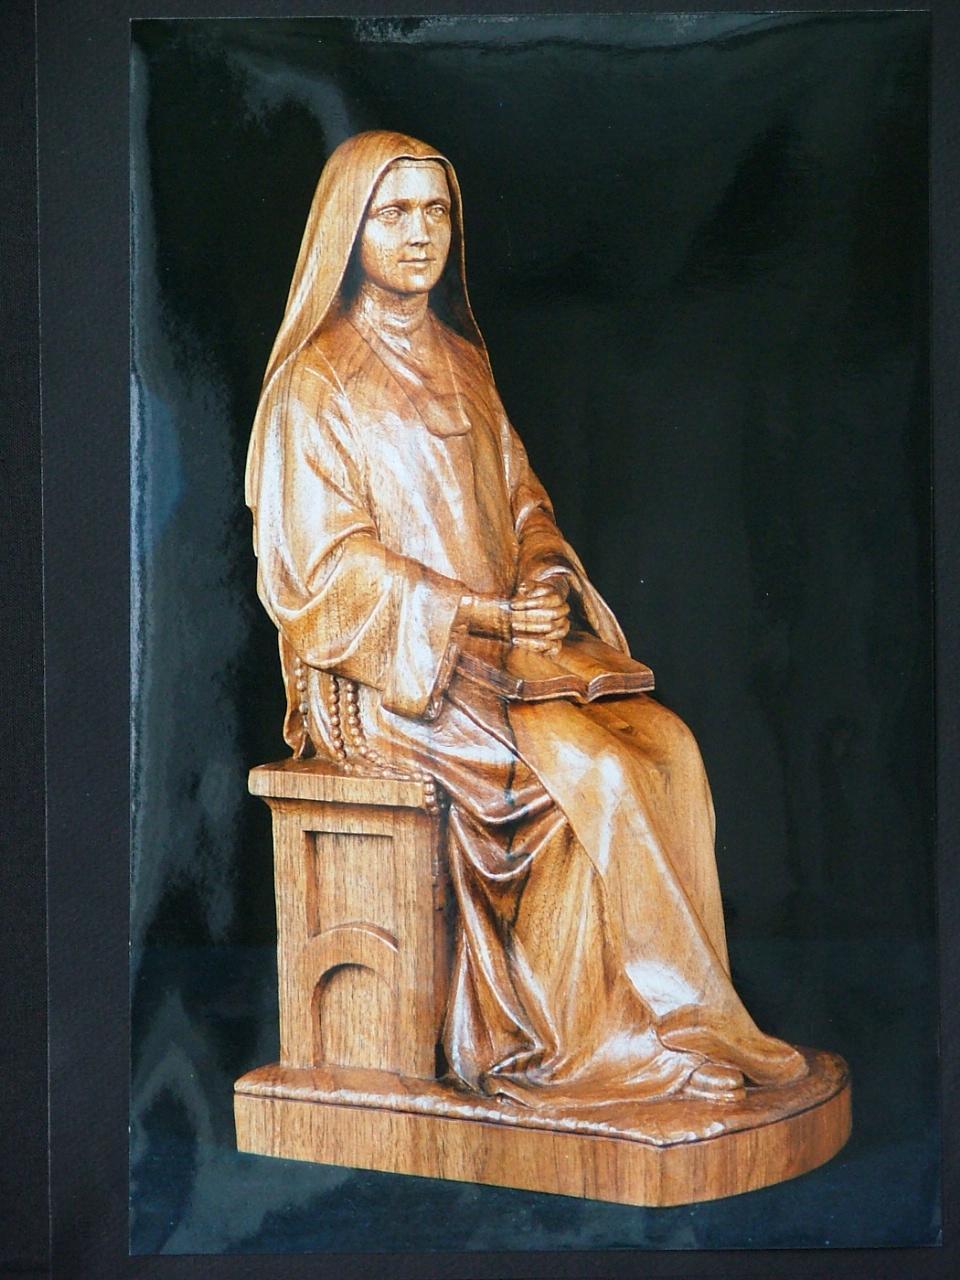 Galerie sculptures bois figuratives - Ste Thérèse assise